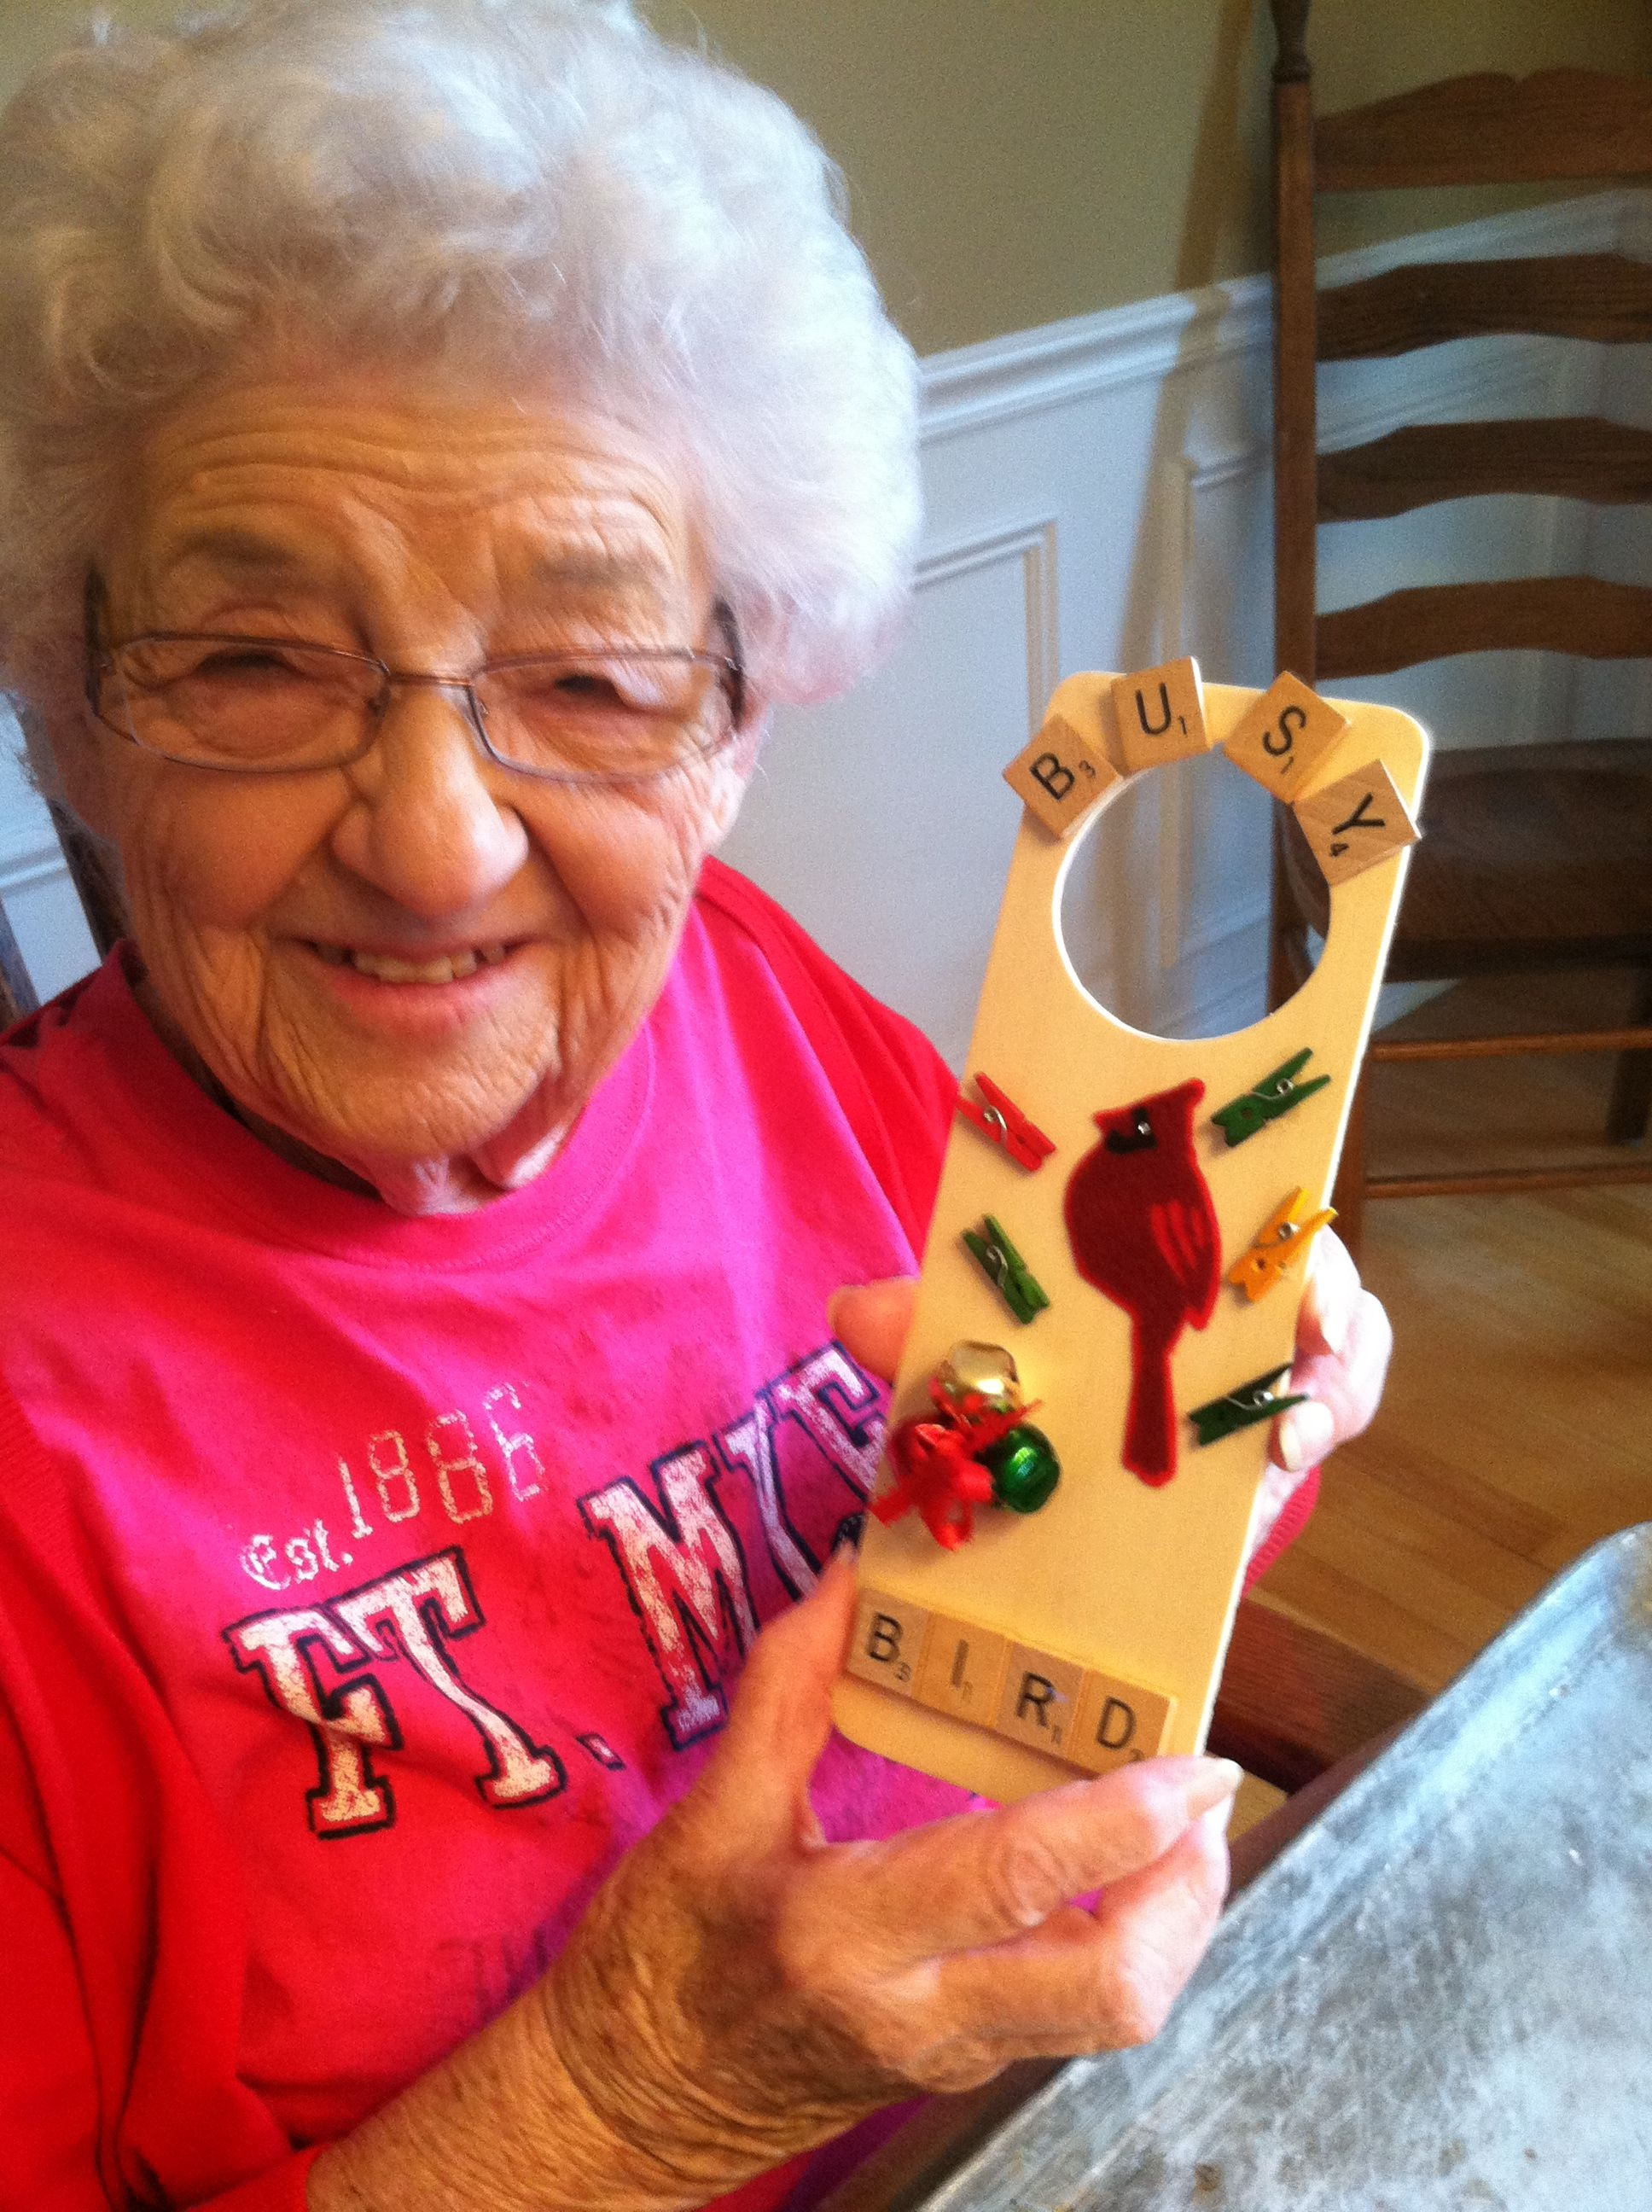 Senior center door sign Elderly activities, Nursing home